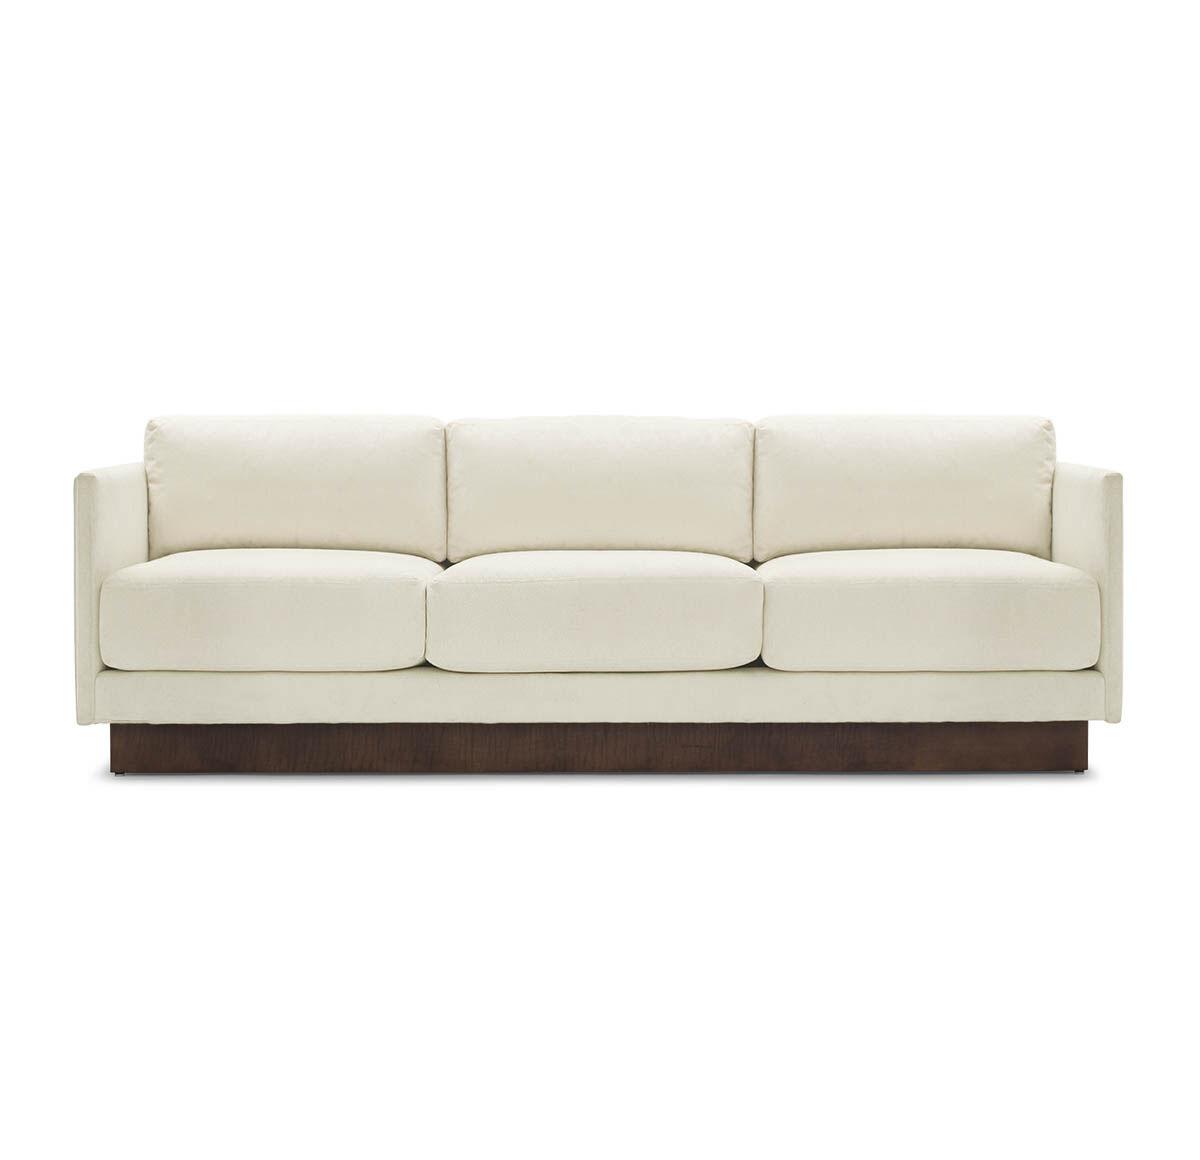 mitc gold hunter sofa second hand 2 seater beds mgbw 62 with jinanhongyu - thesofa